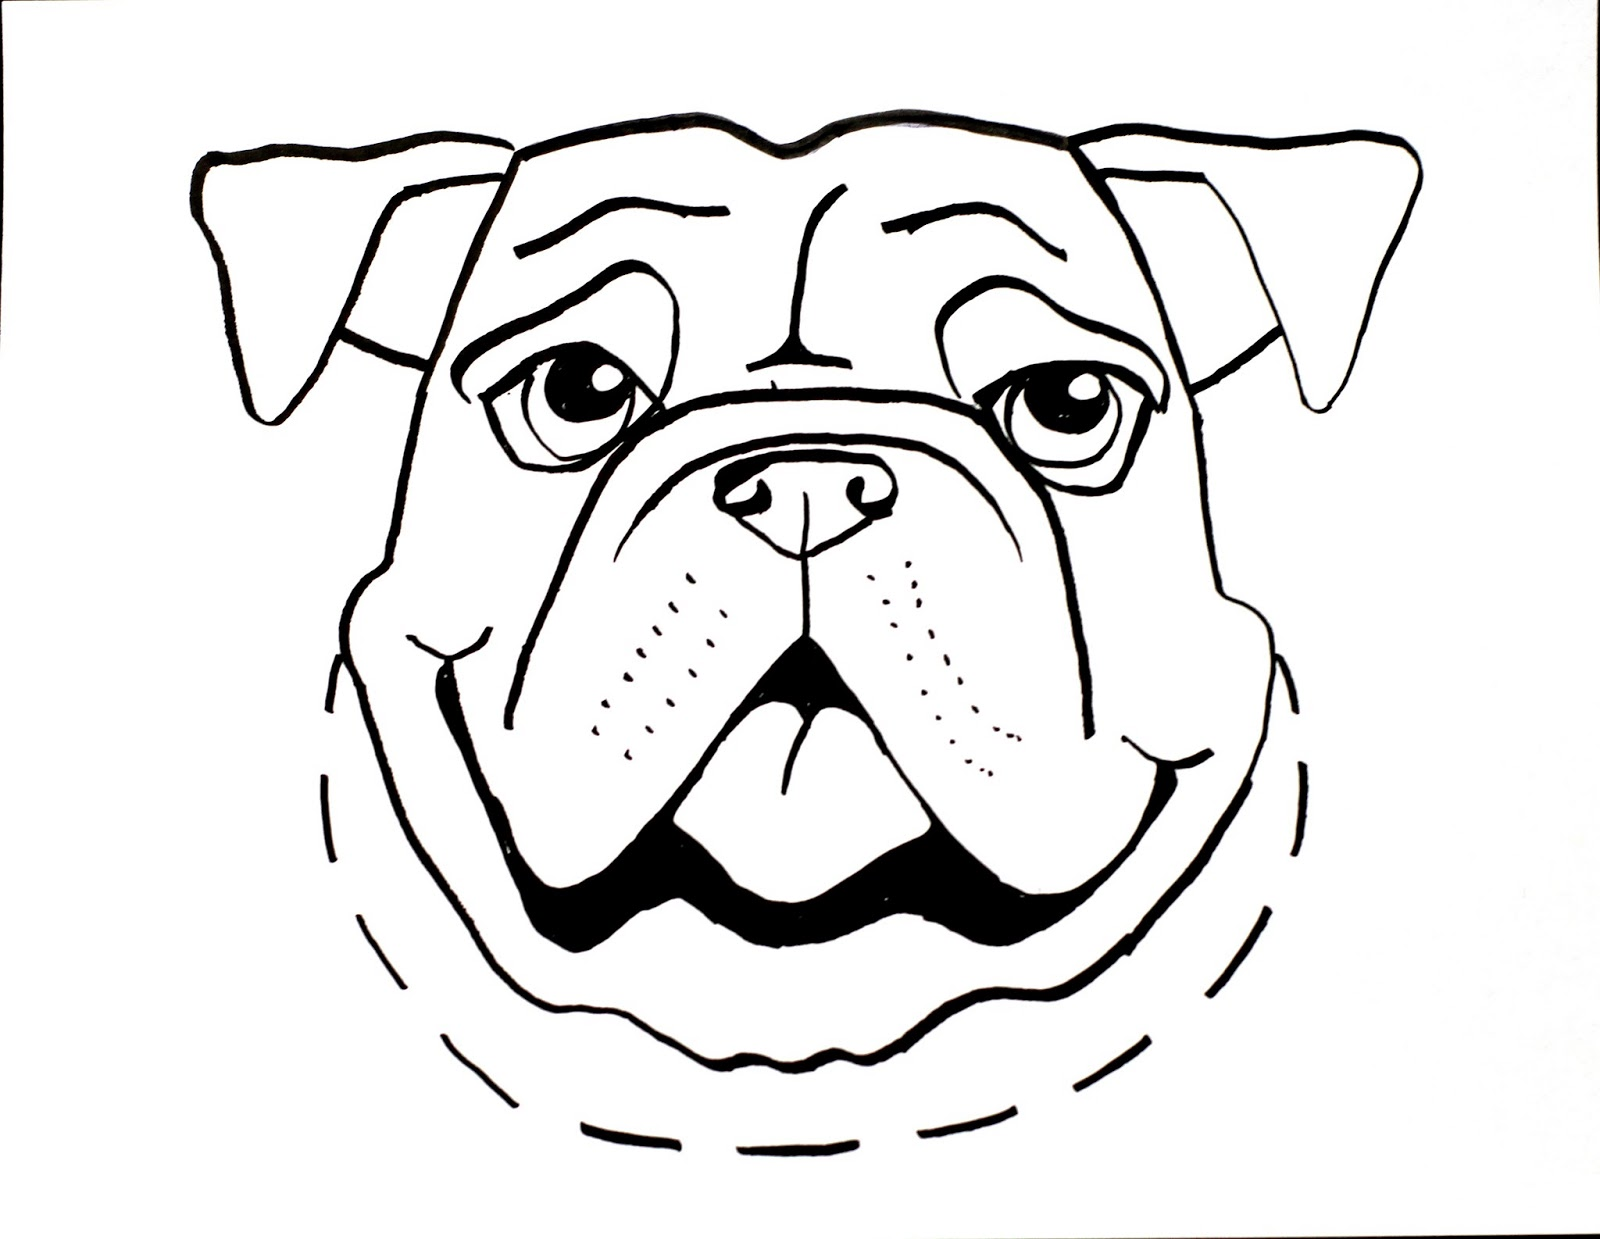 seeing eye dog clipart free download best seeing eye dog clipart